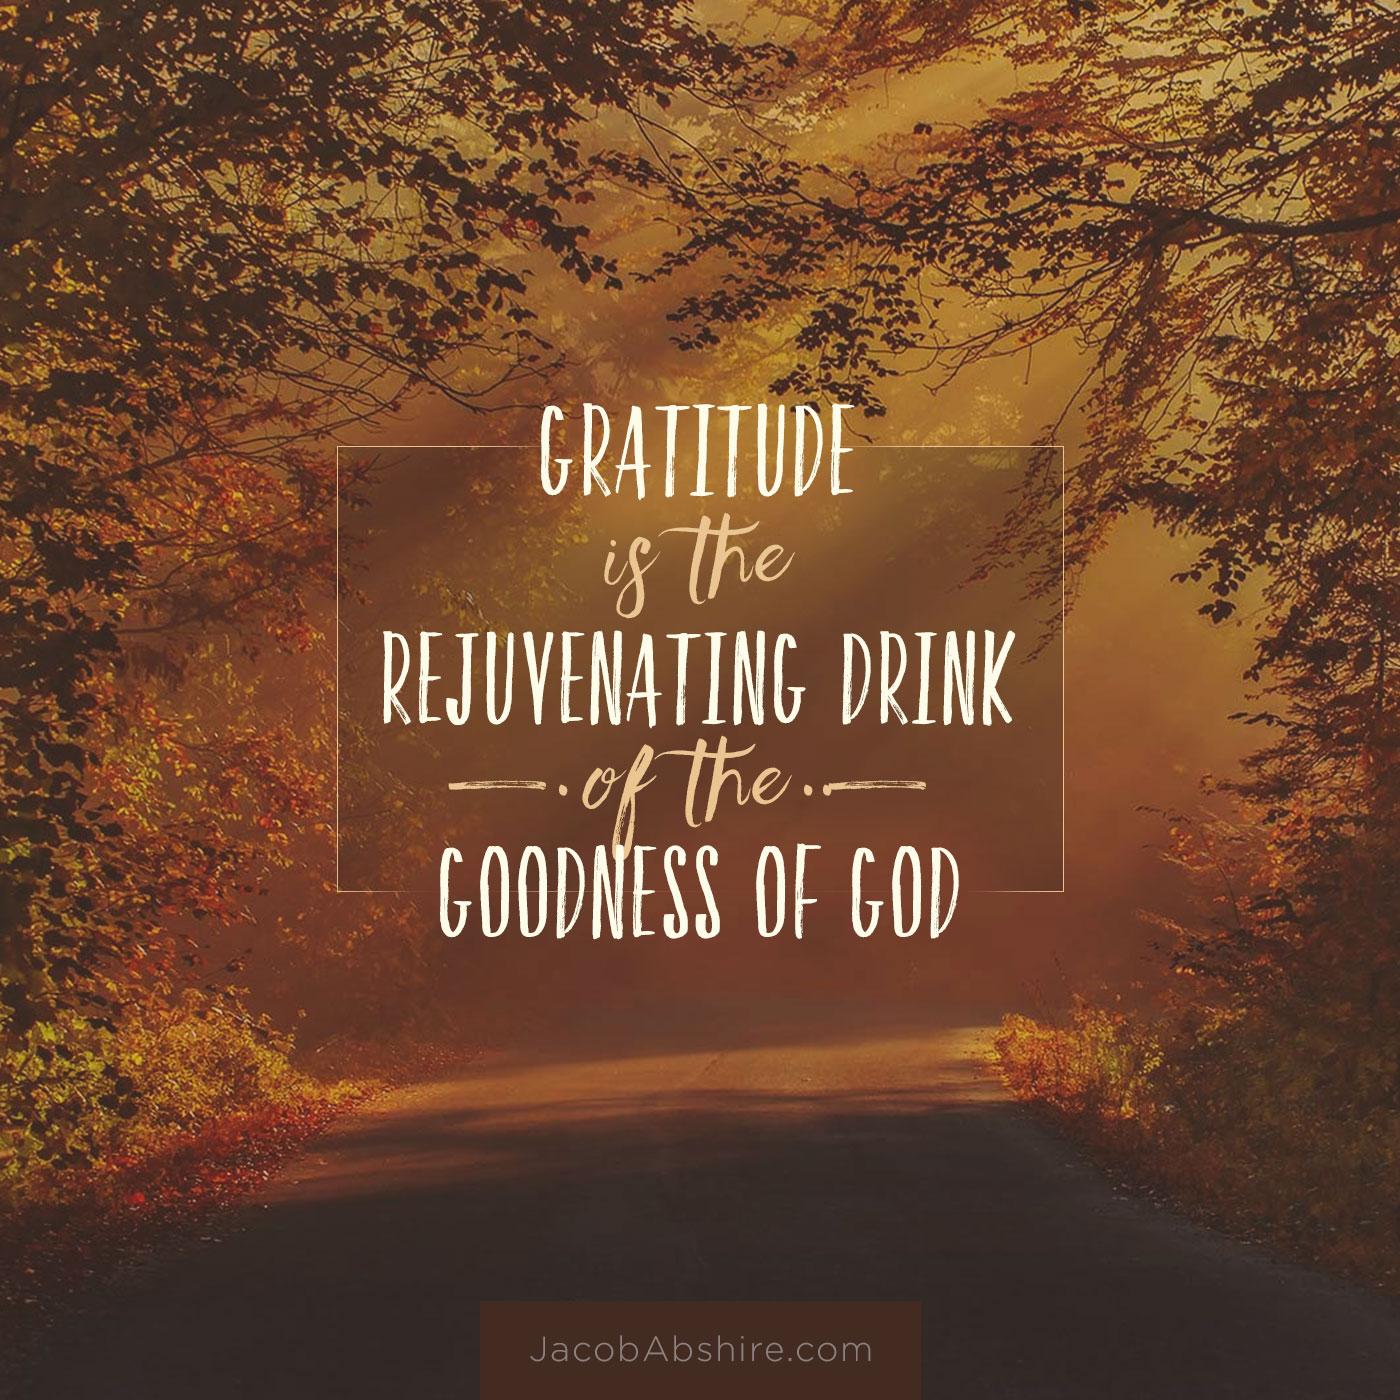 meme-gratitude-drink-goodness